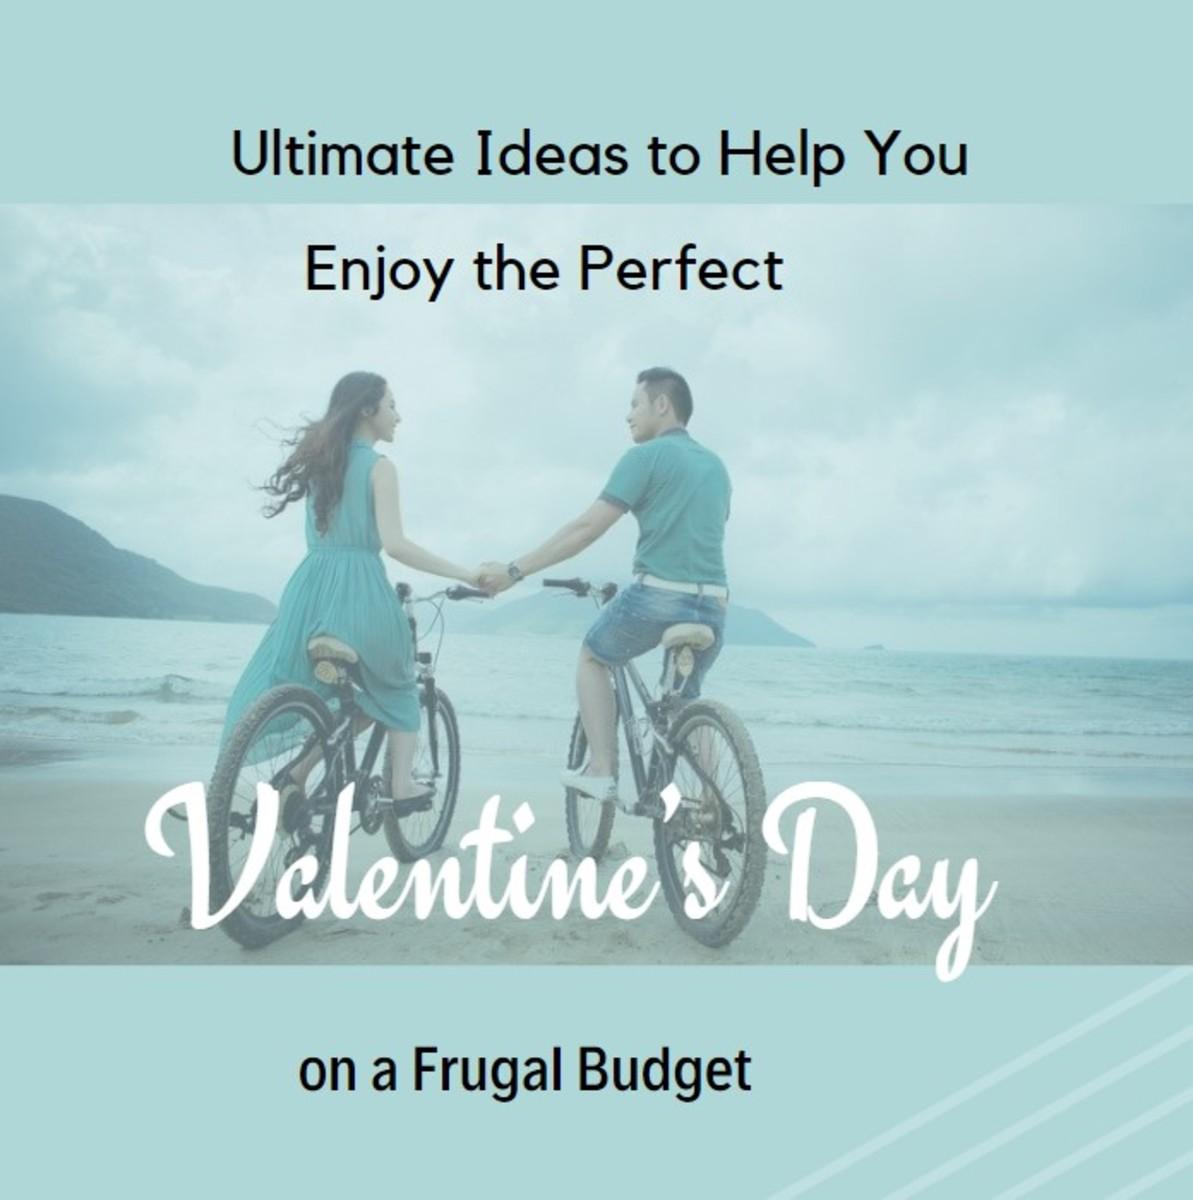 valentinesonbudget